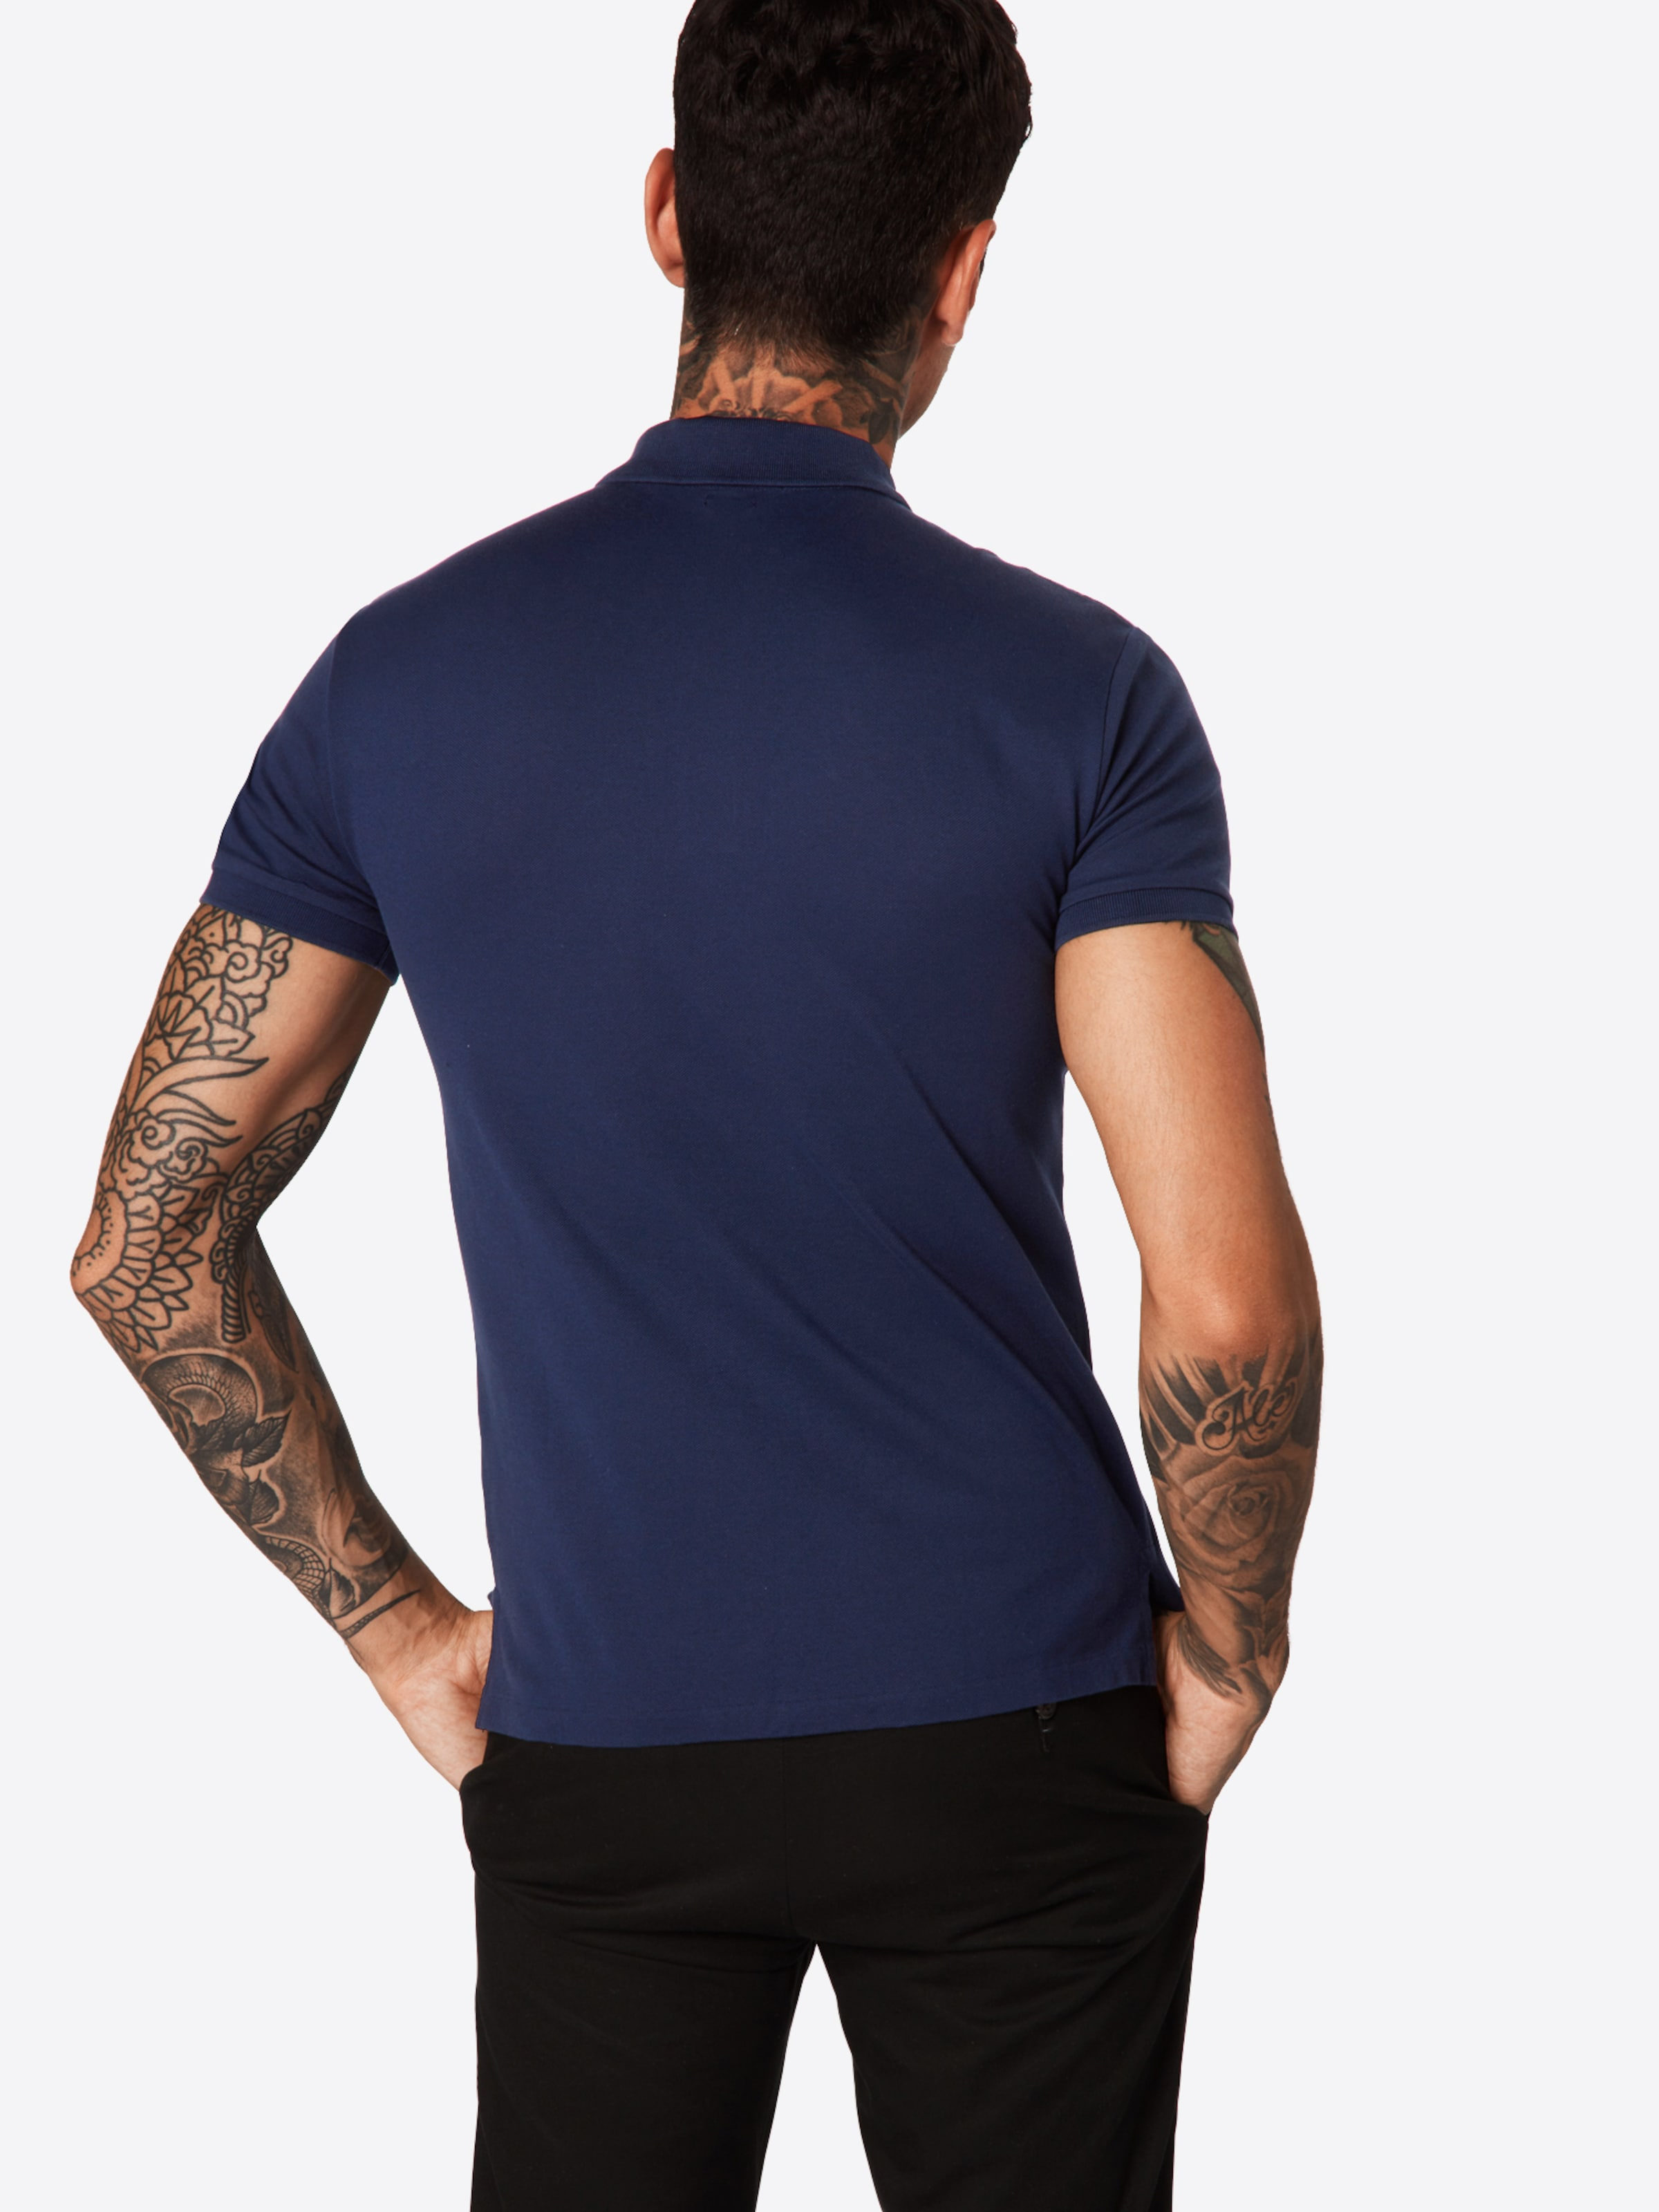 Sleeve Gris short Polo shirt En Ralph 'sskcslm1 Lauren knit' T W2YeE9DIH